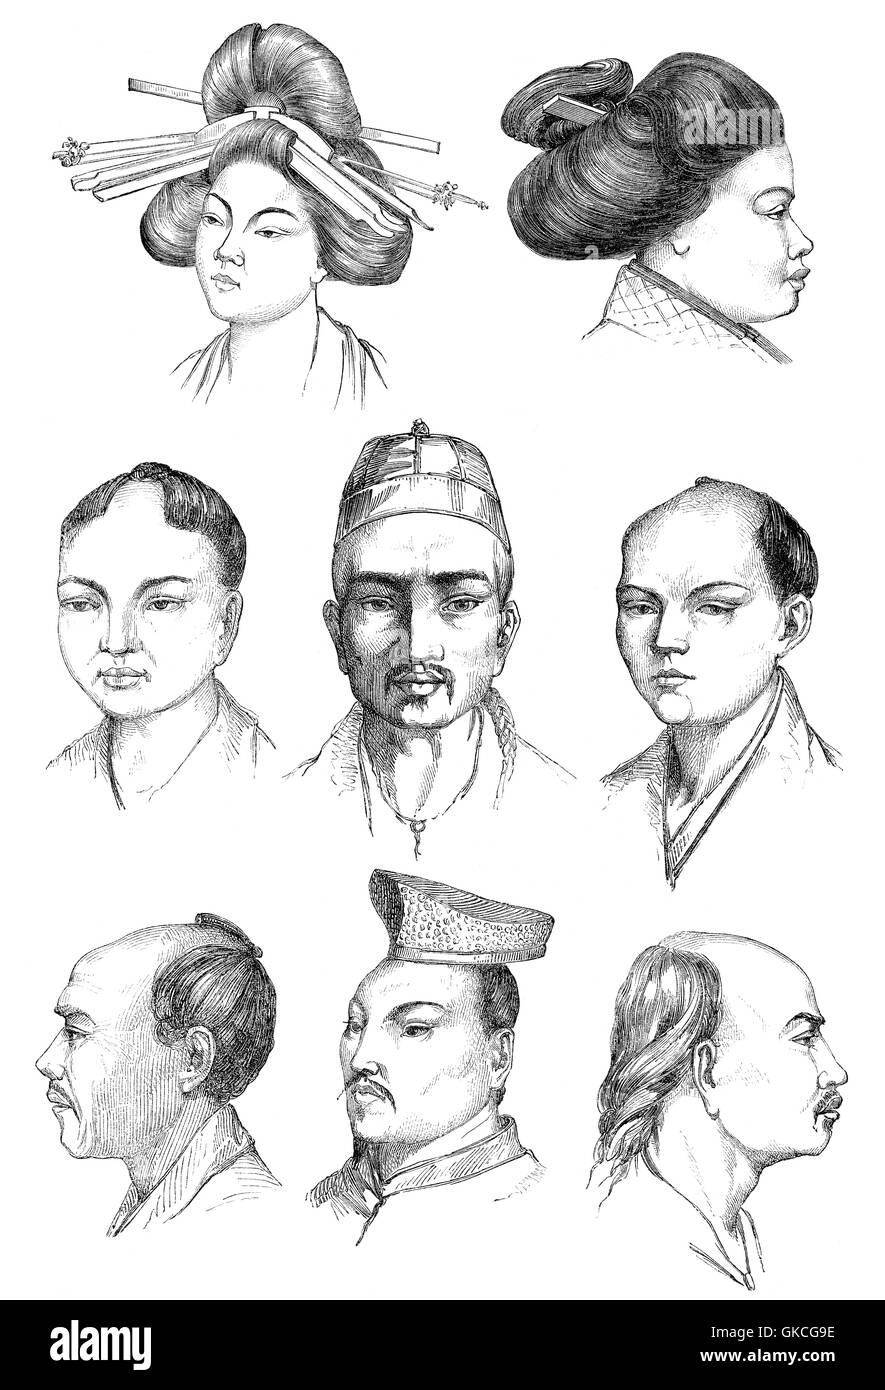 Japanese people, illustration, 19th century - Stock Image